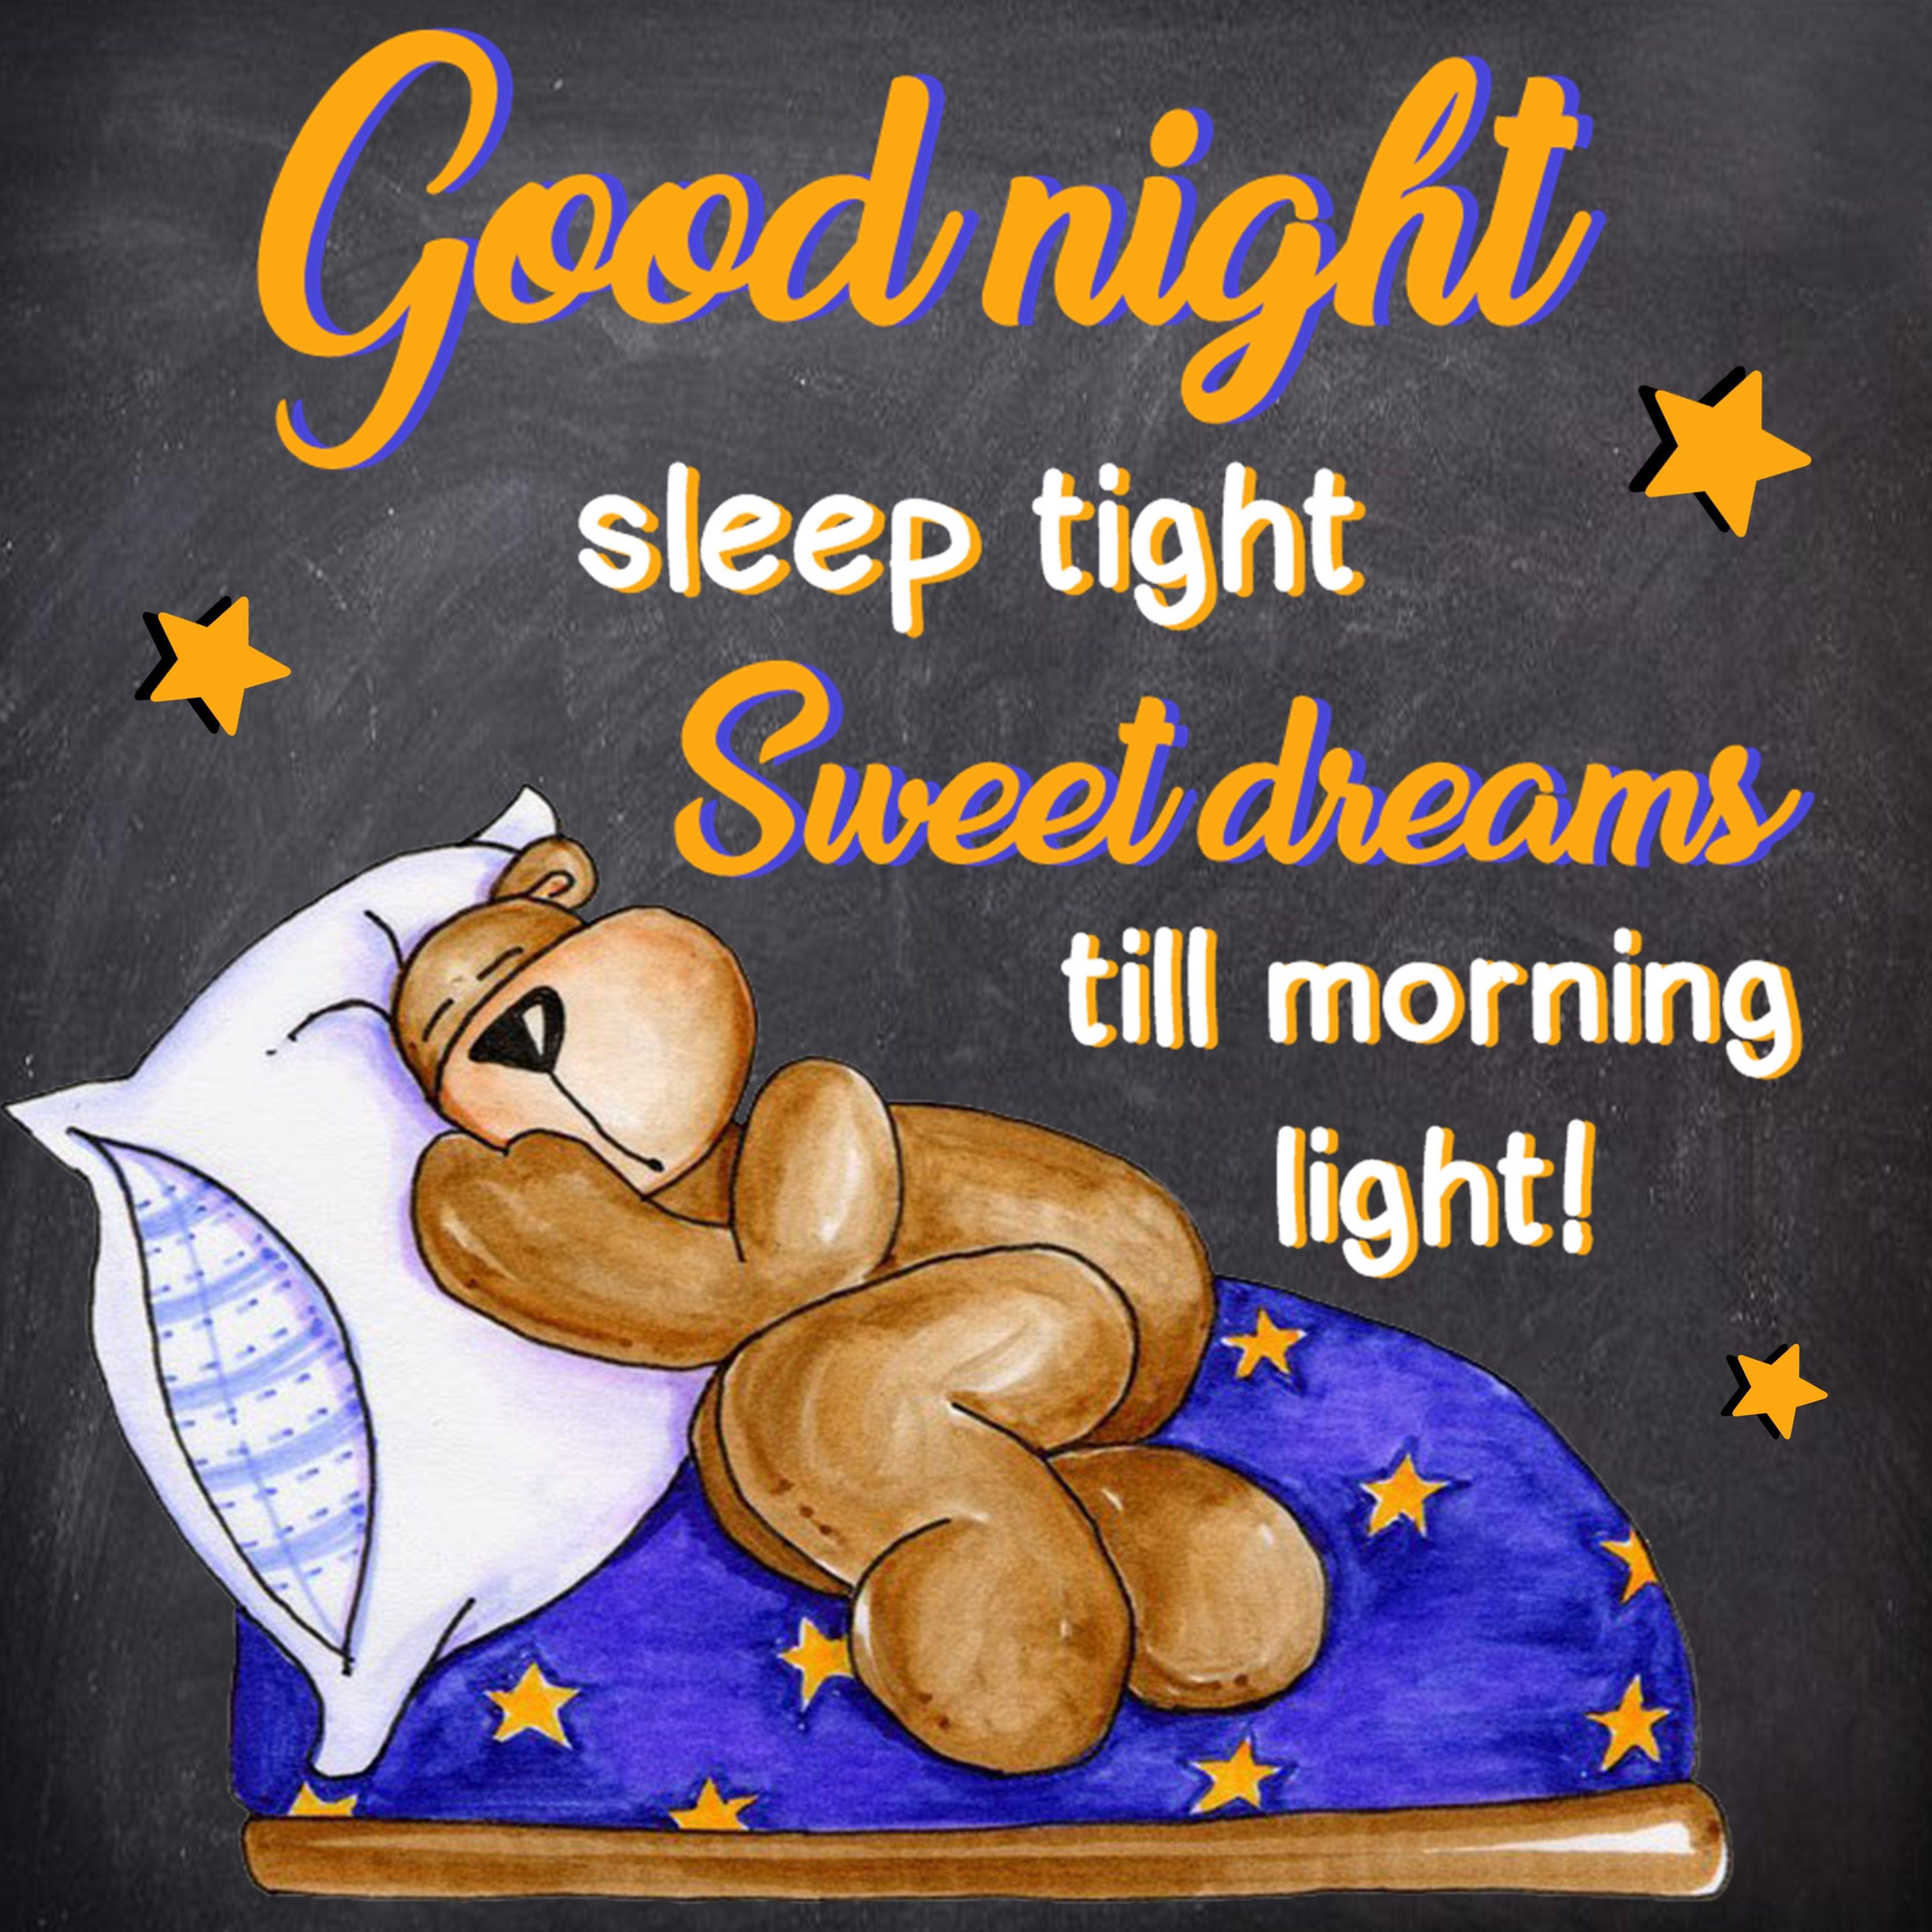 Good Night Sleep Tight Sweet Dreams Till Morning Light Good Night Greetings Sweet Dreams Sleep Tight Good Night Funny